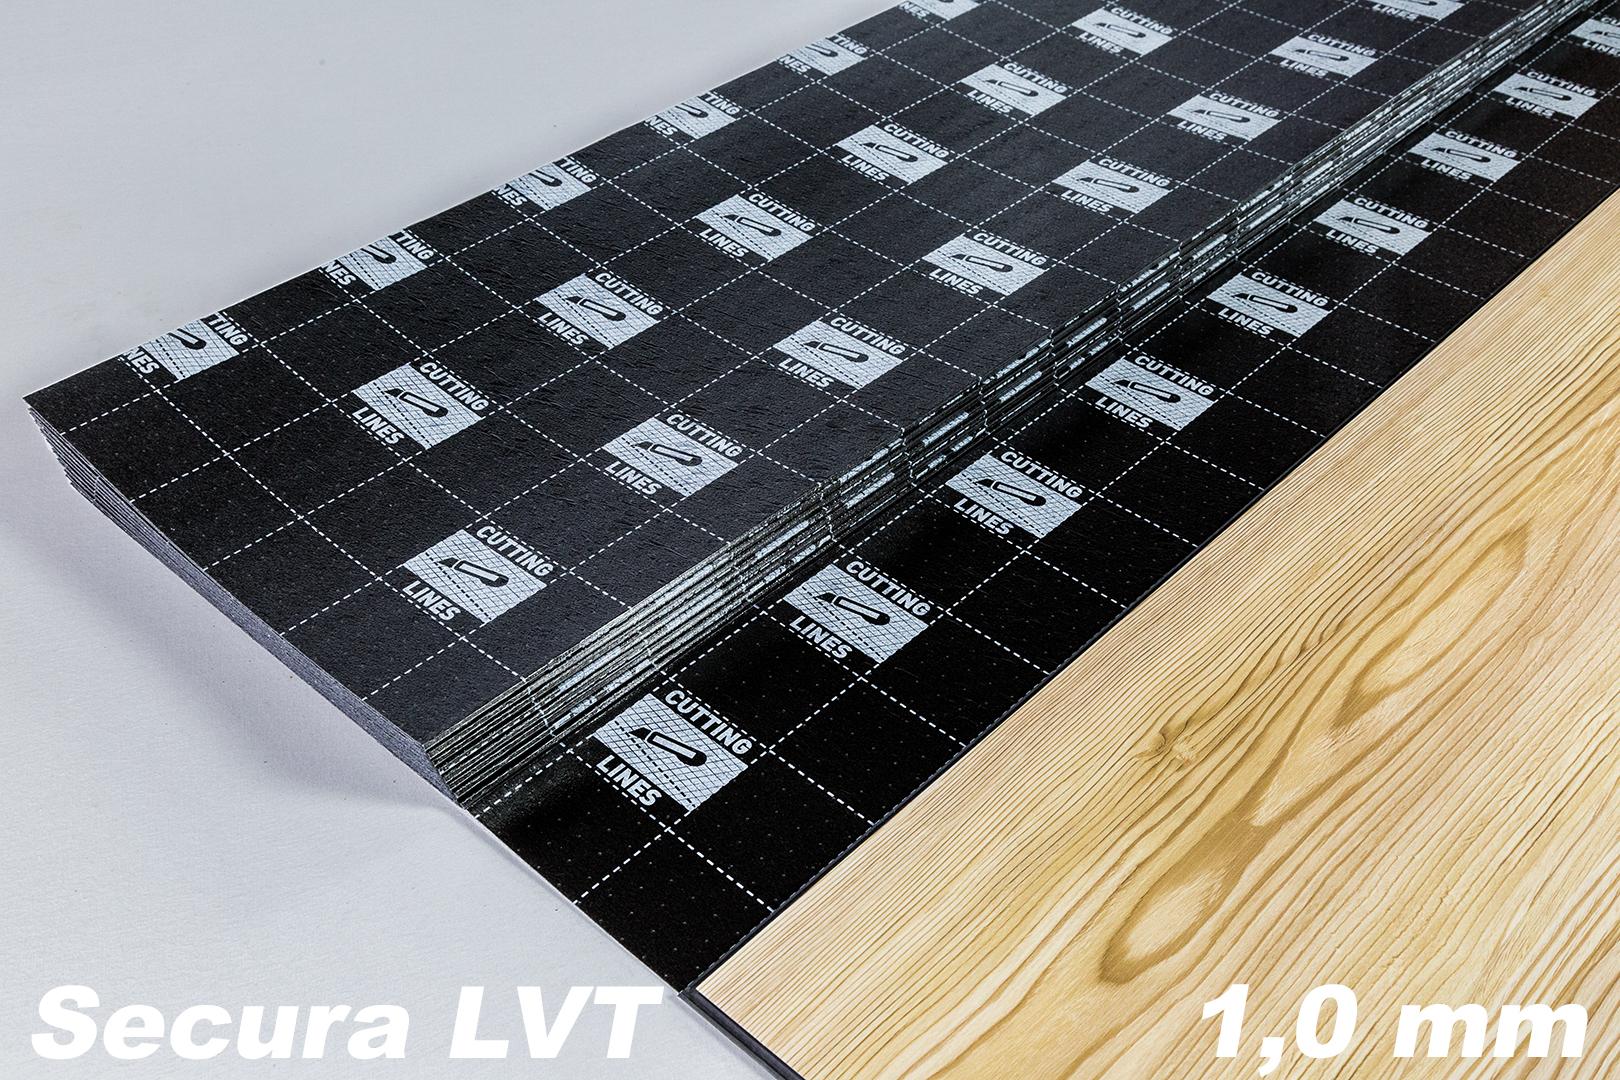 100 m trittschalld mmung f r vinylboden fu bodenheizung klick vinyl secura lvt ebay. Black Bedroom Furniture Sets. Home Design Ideas